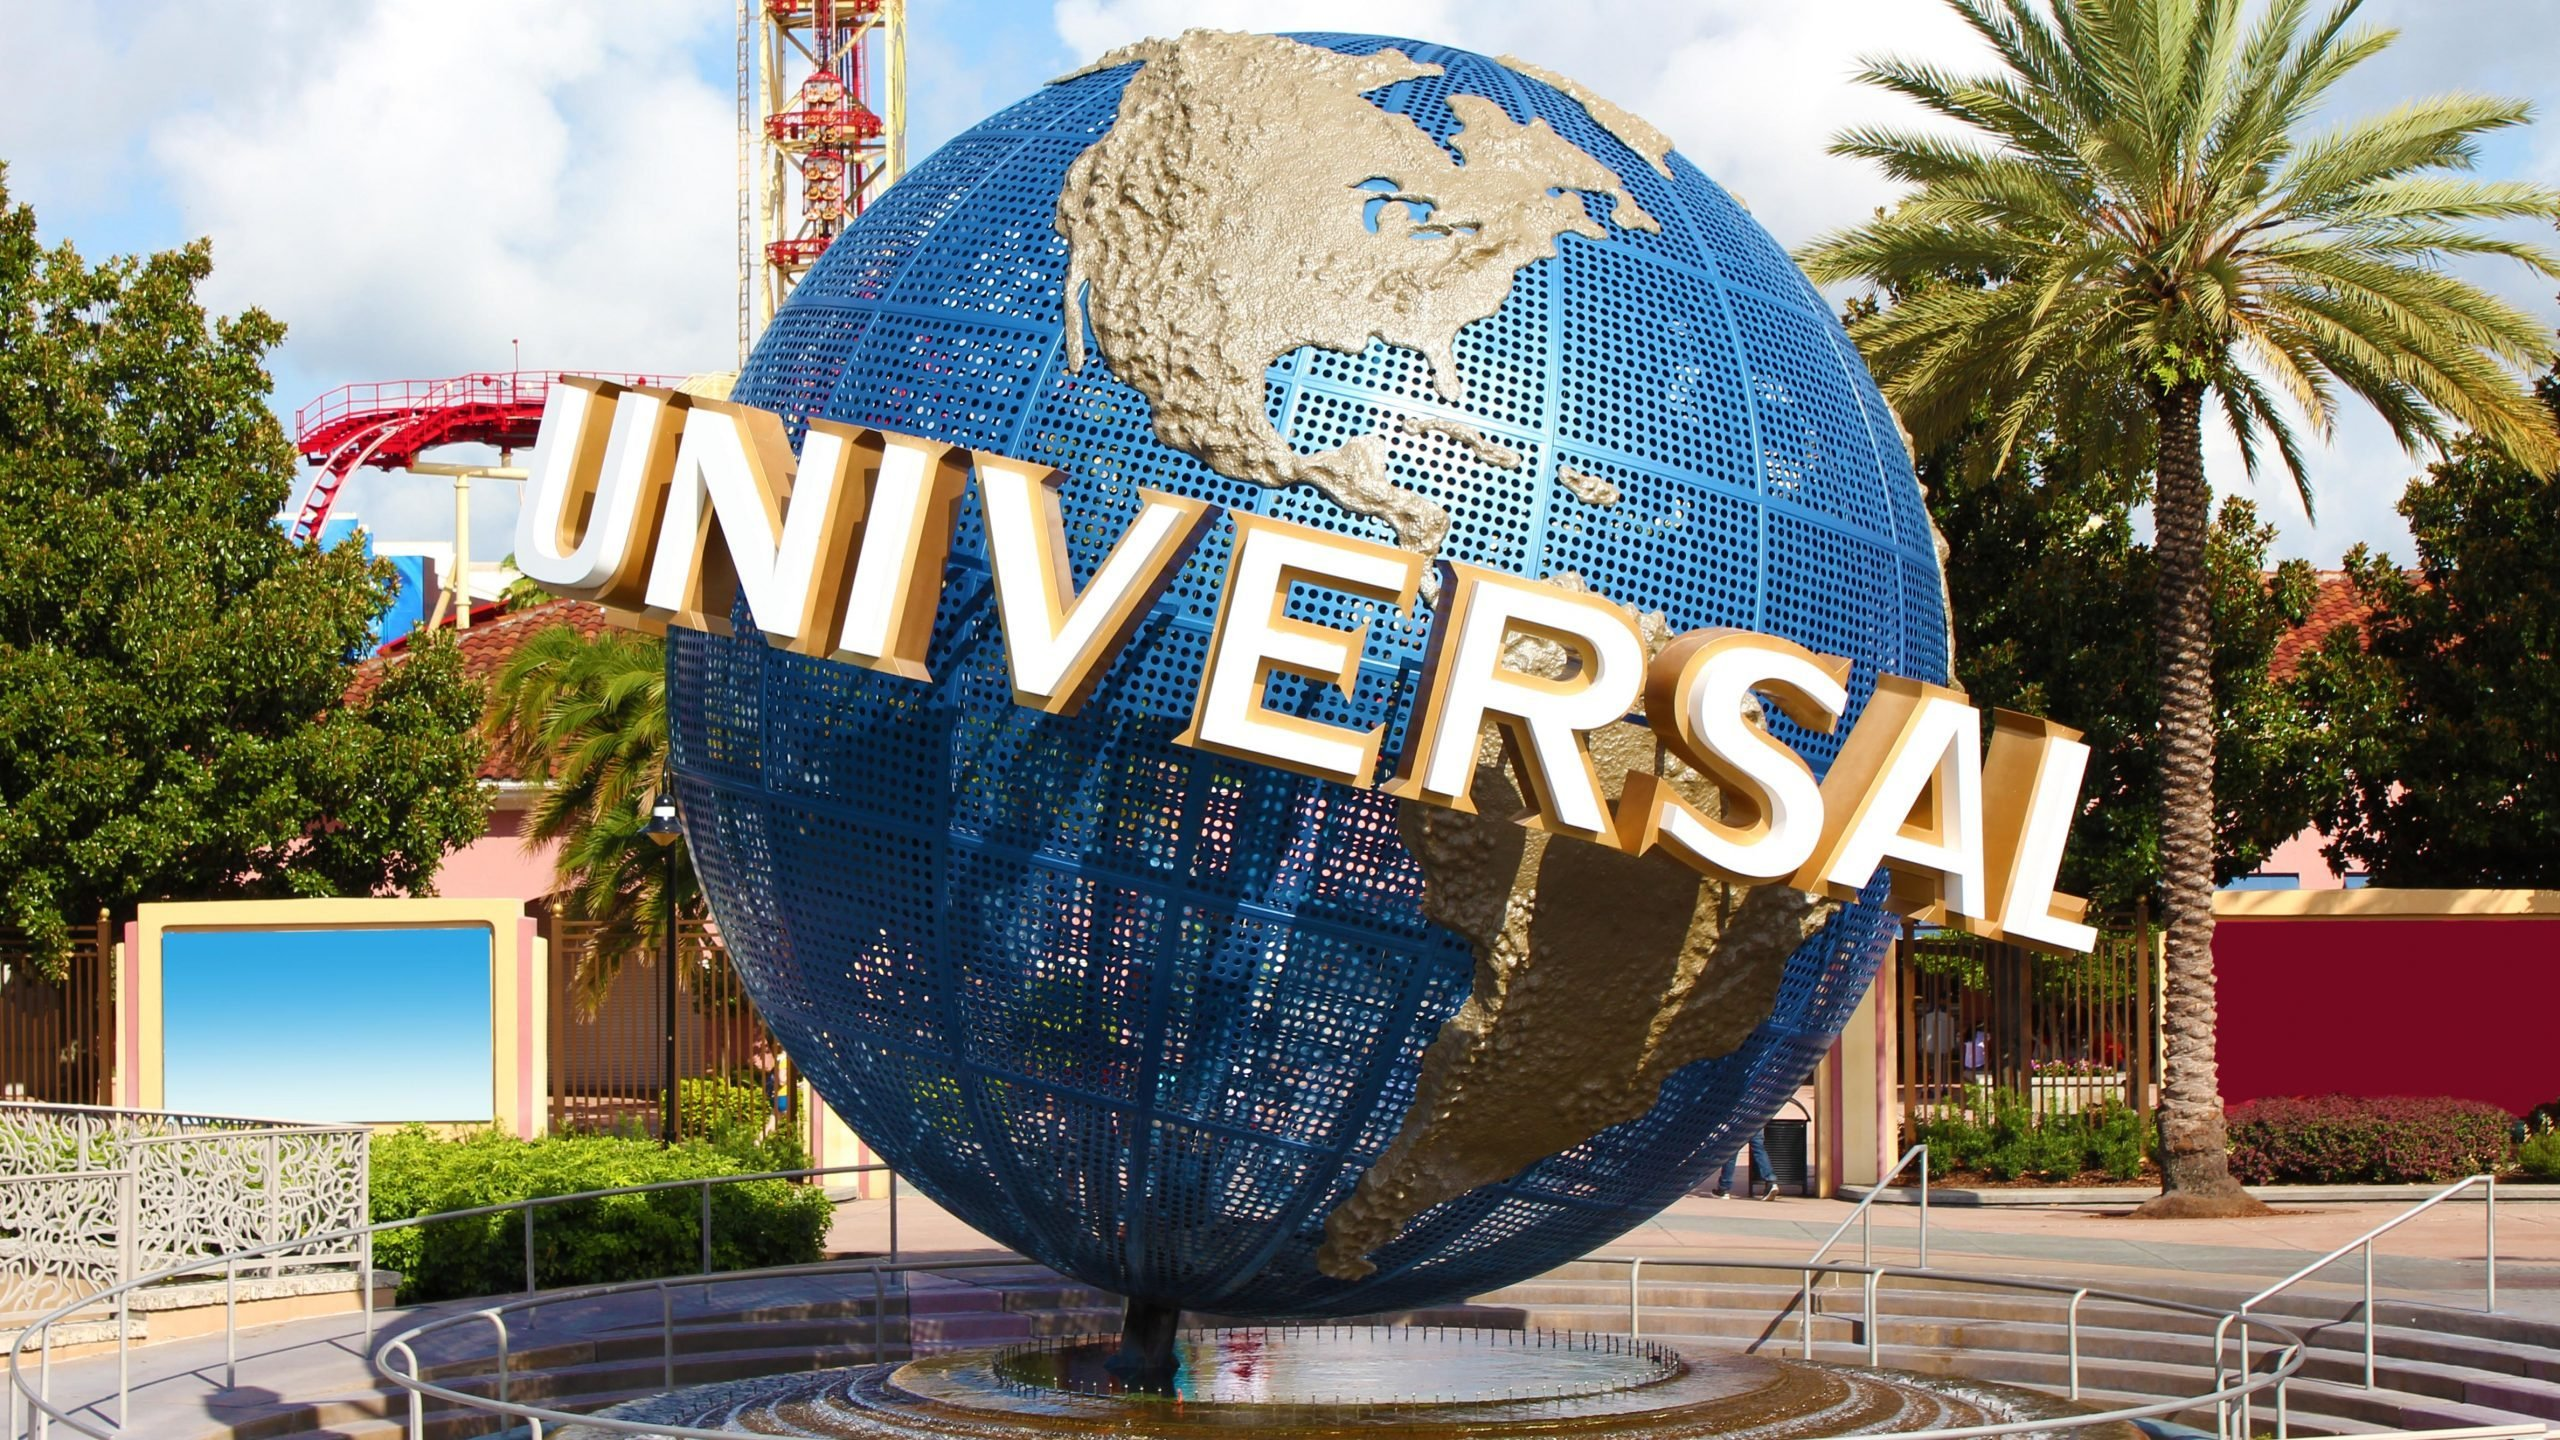 Orlando, Florida, United States - July 02, 2011. Universal Studios globe sign at entrance.